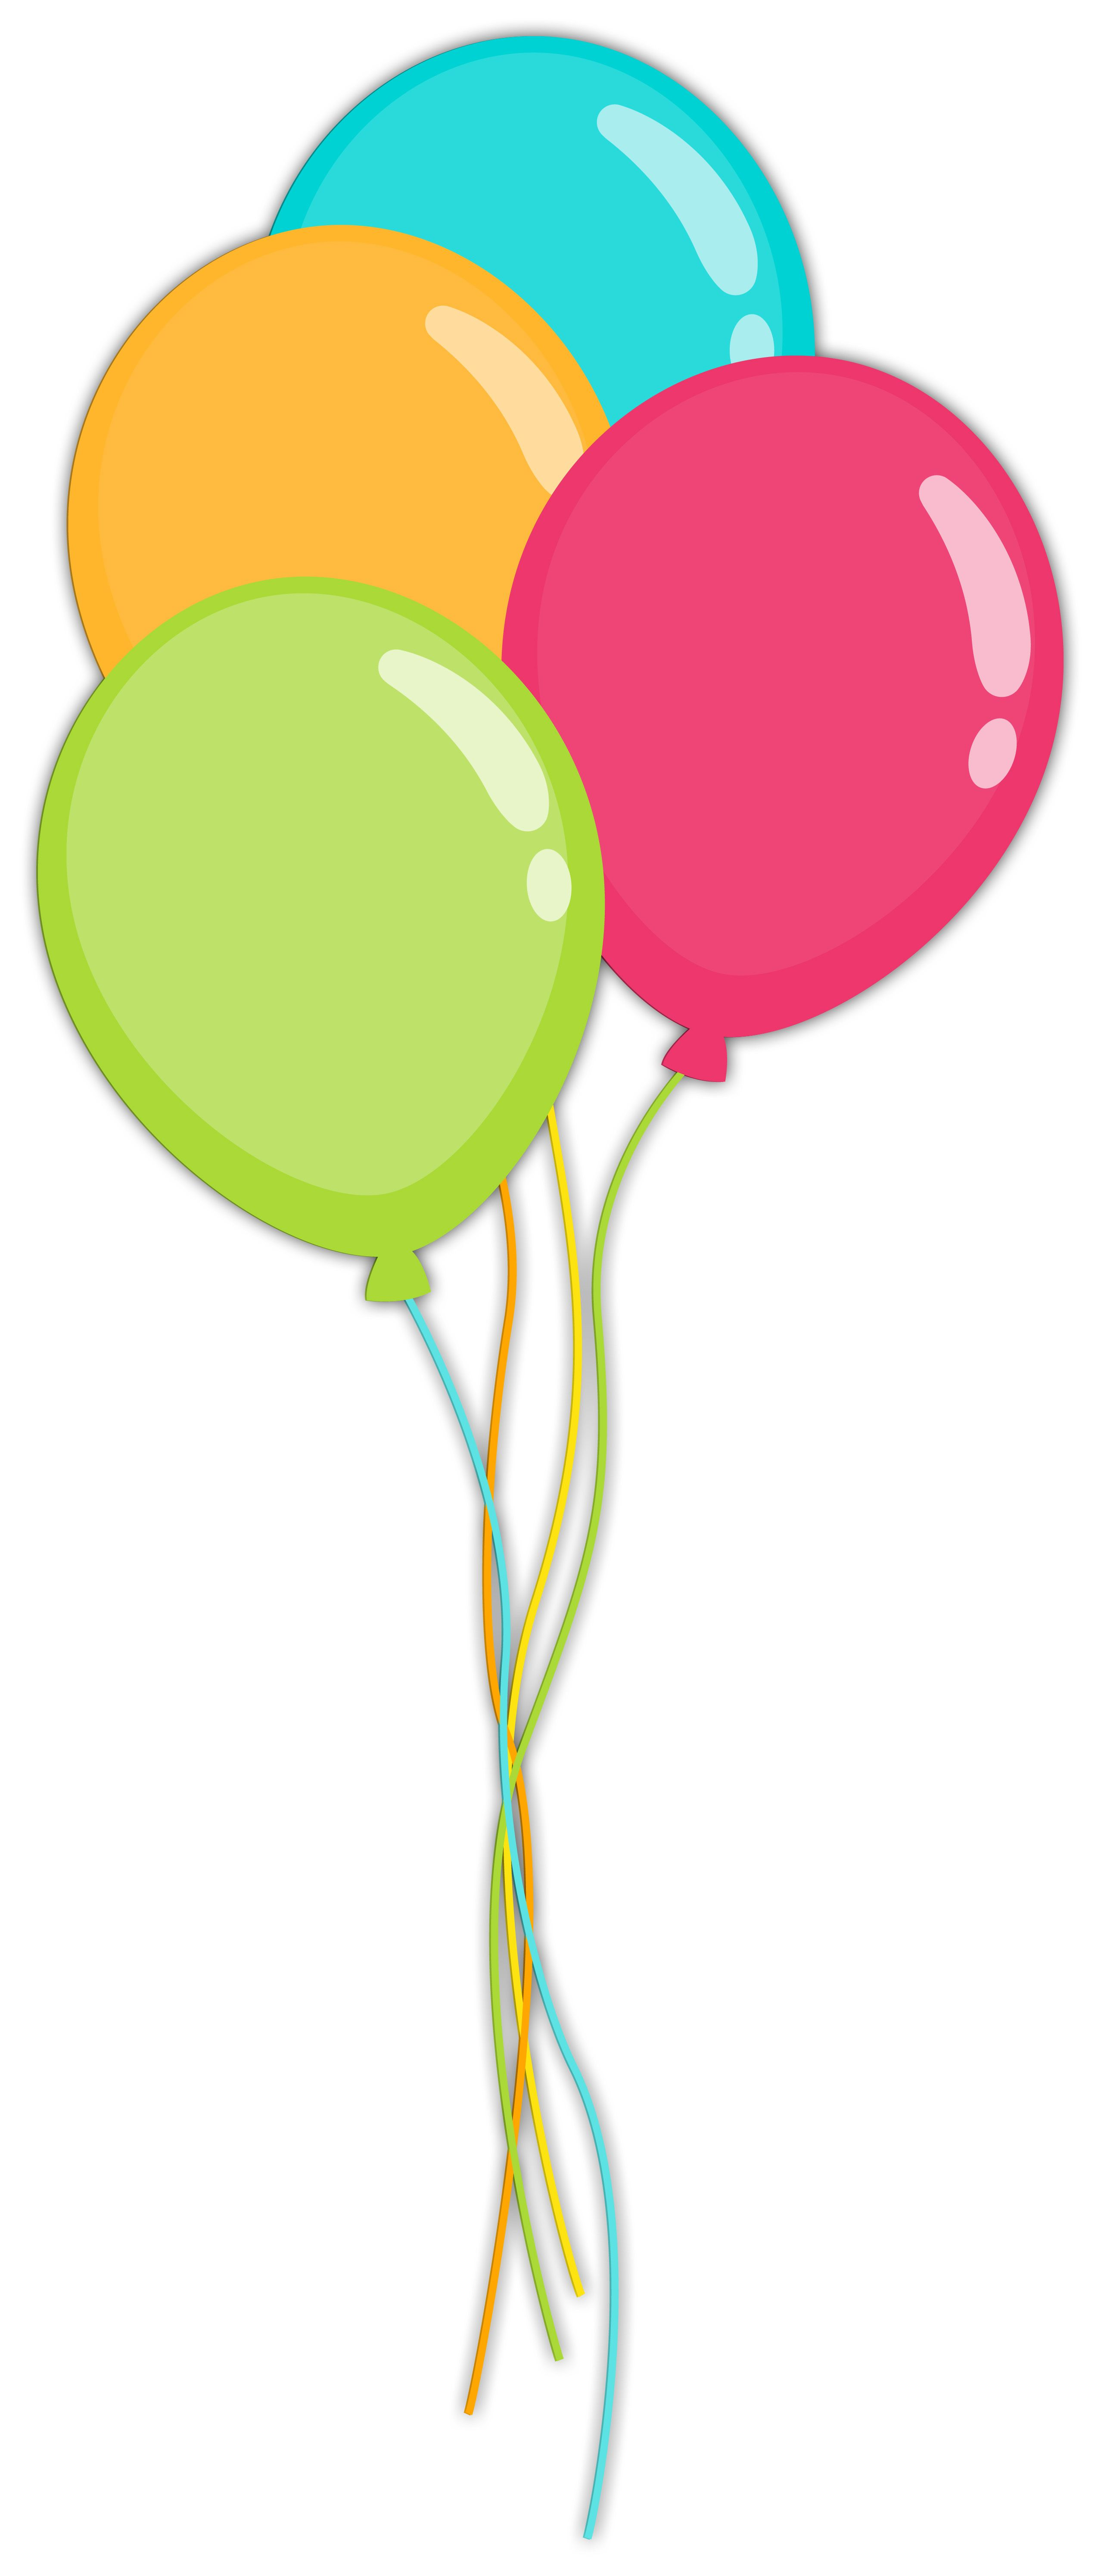 2549x5981 Balloons Clip Art Clip Art